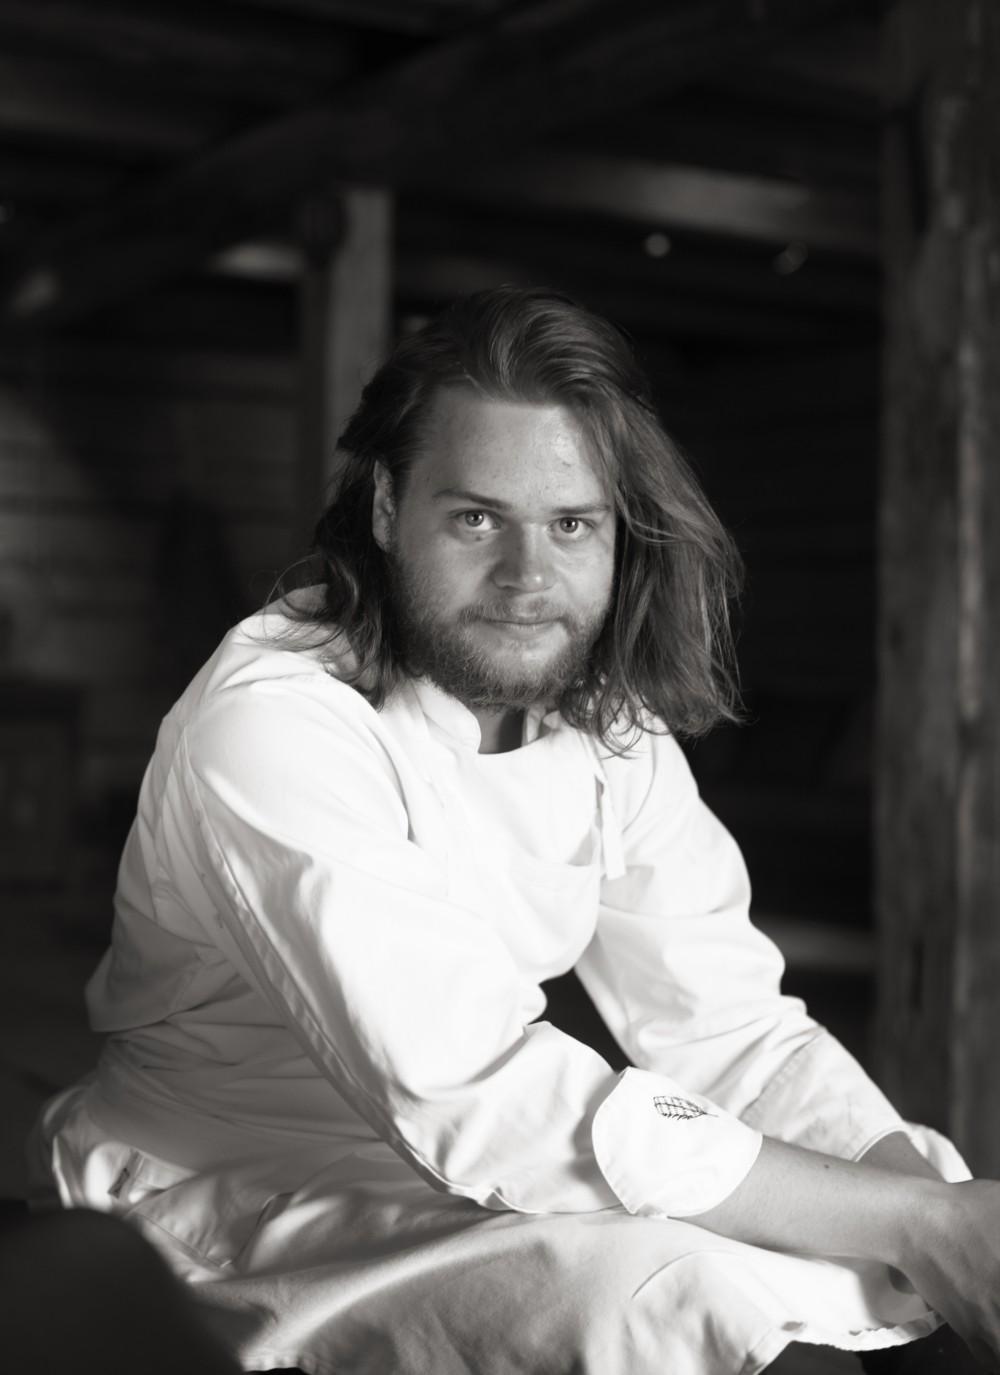 Magnus Nilsson of Swedish Fäviken. Photo: AnnVixen TellusThinkTank.com